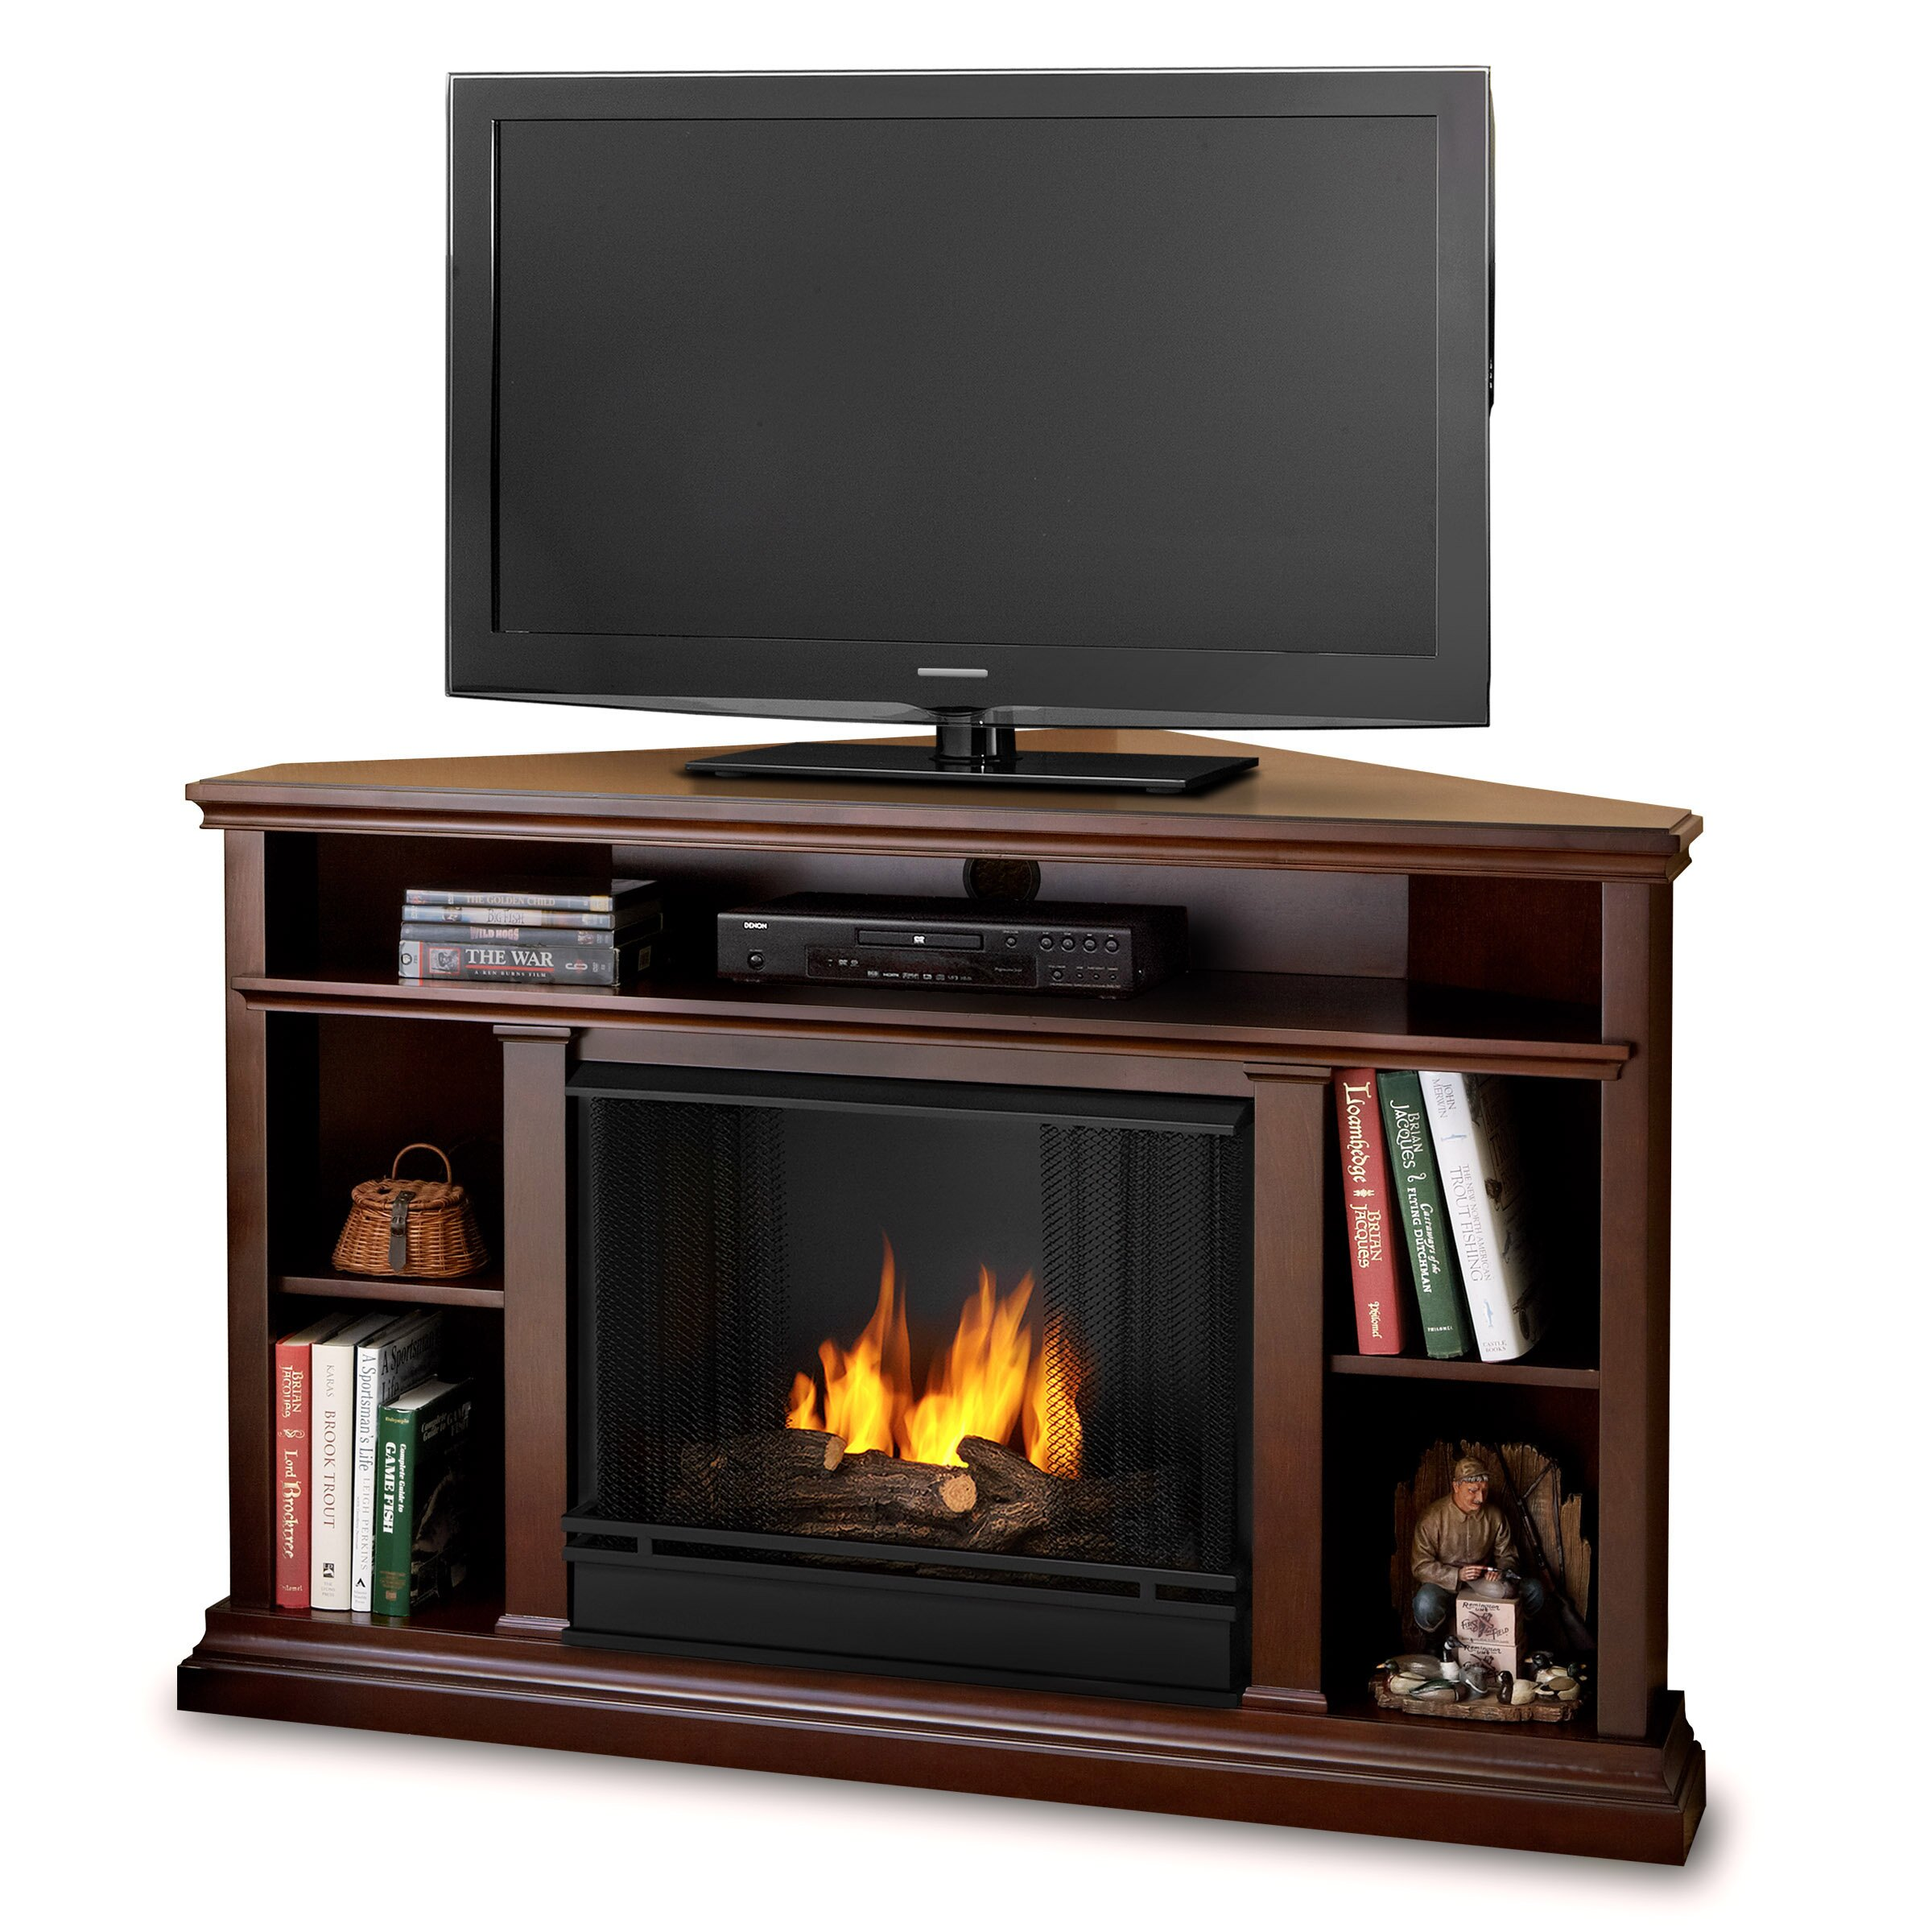 Real flame churchill tv stand reviews wayfair for Wayfair gel fireplace